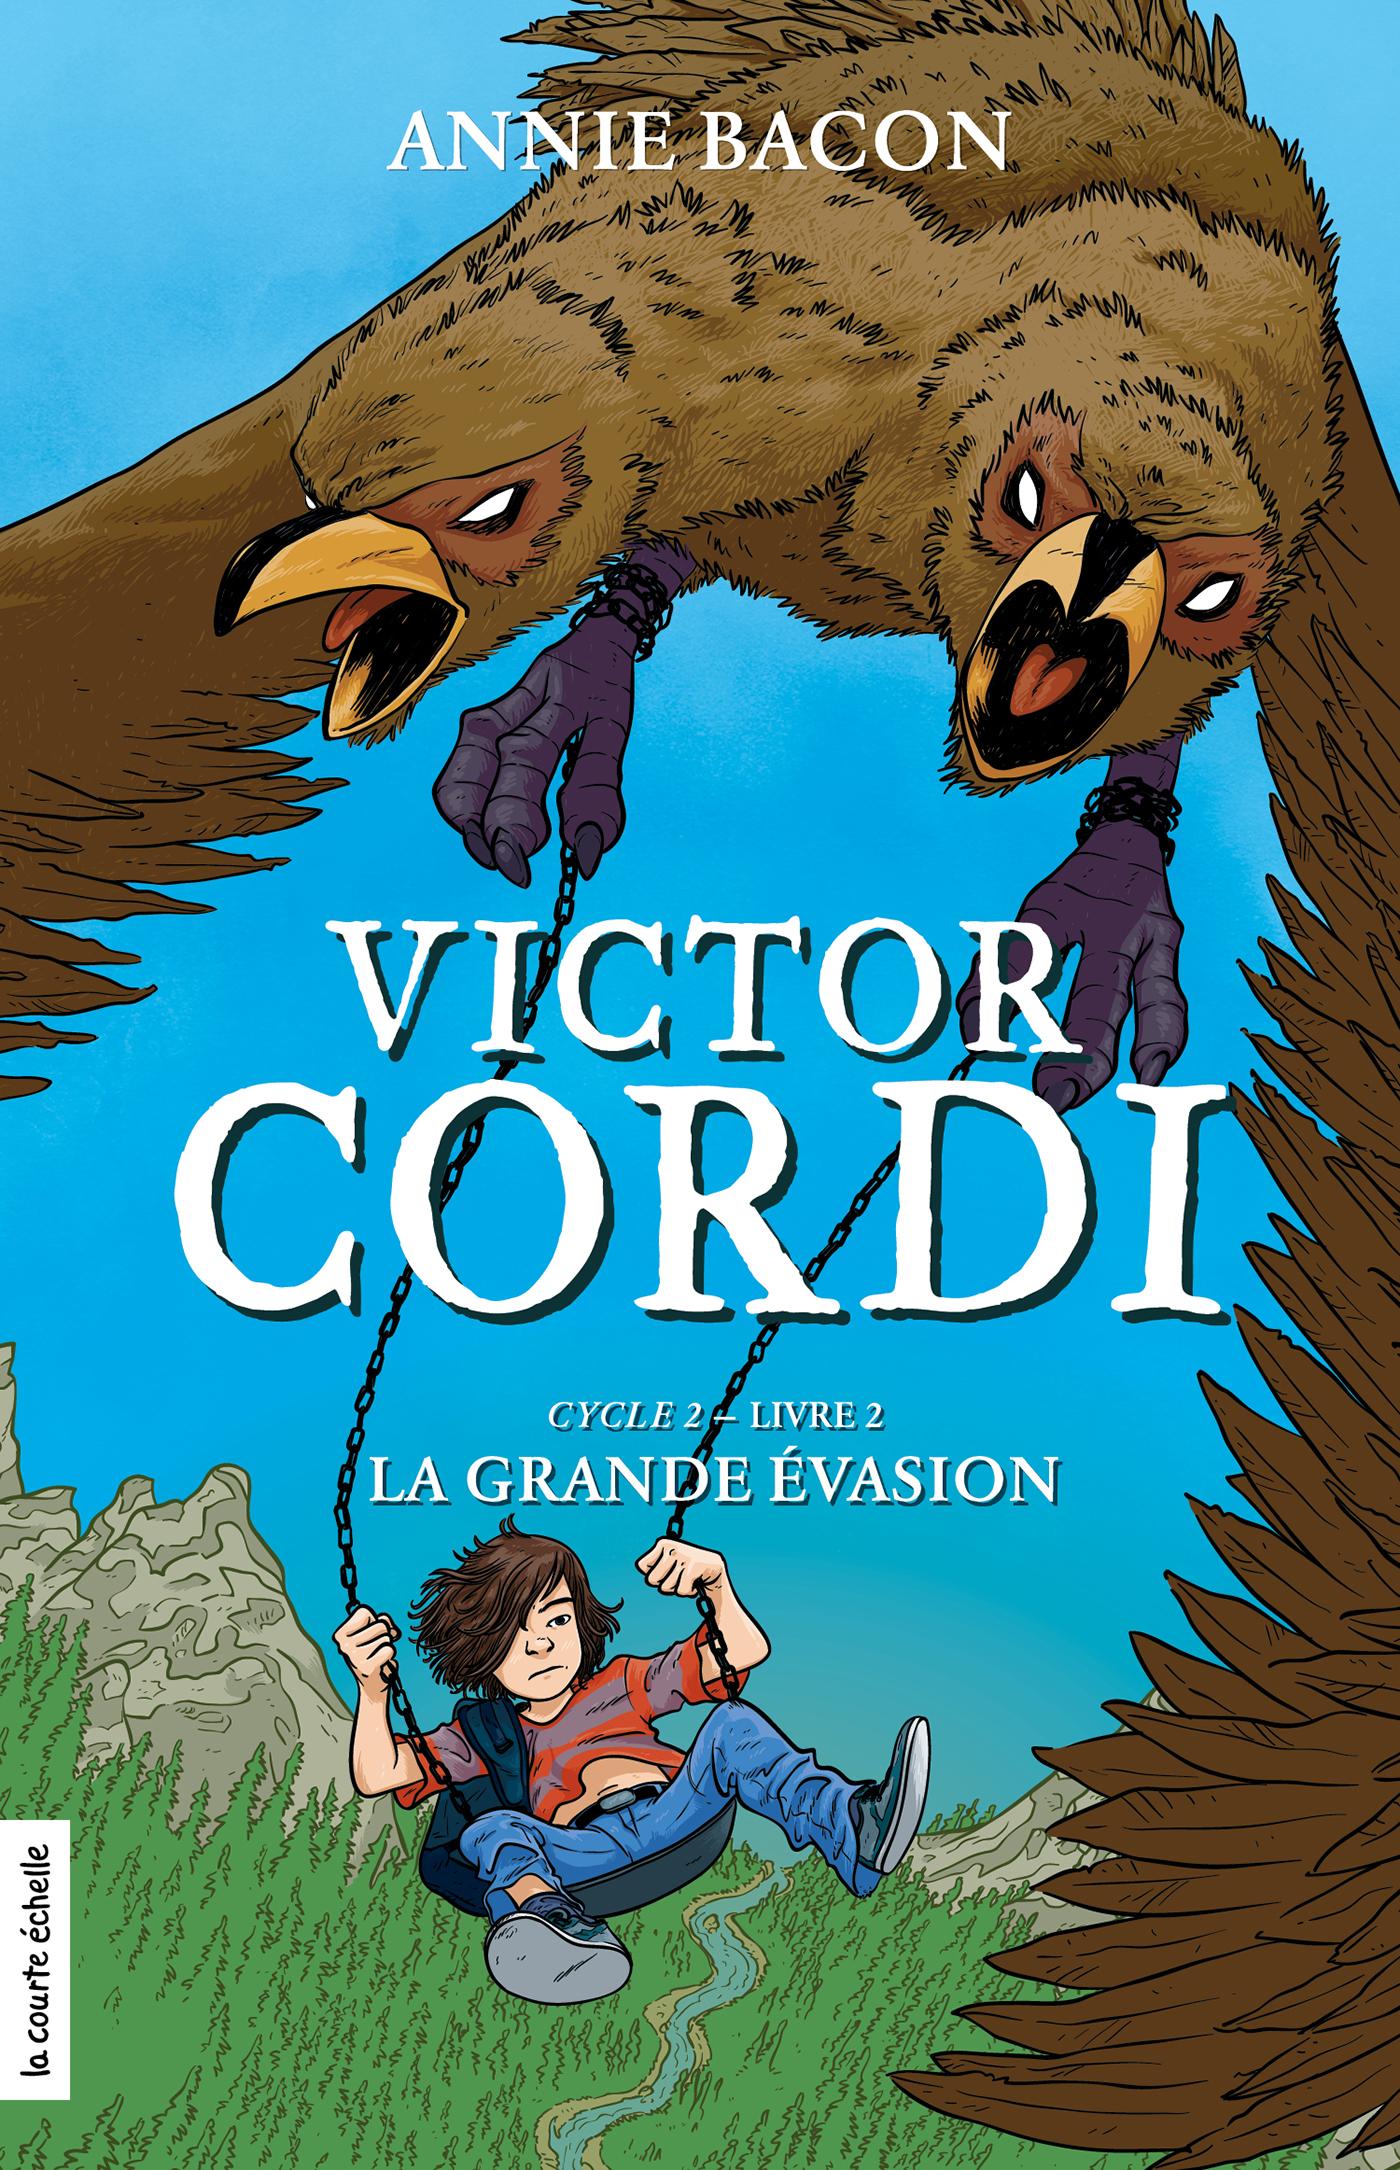 Victor Cordi T.7 : Cycle 2, livre 2 : La grande évasion